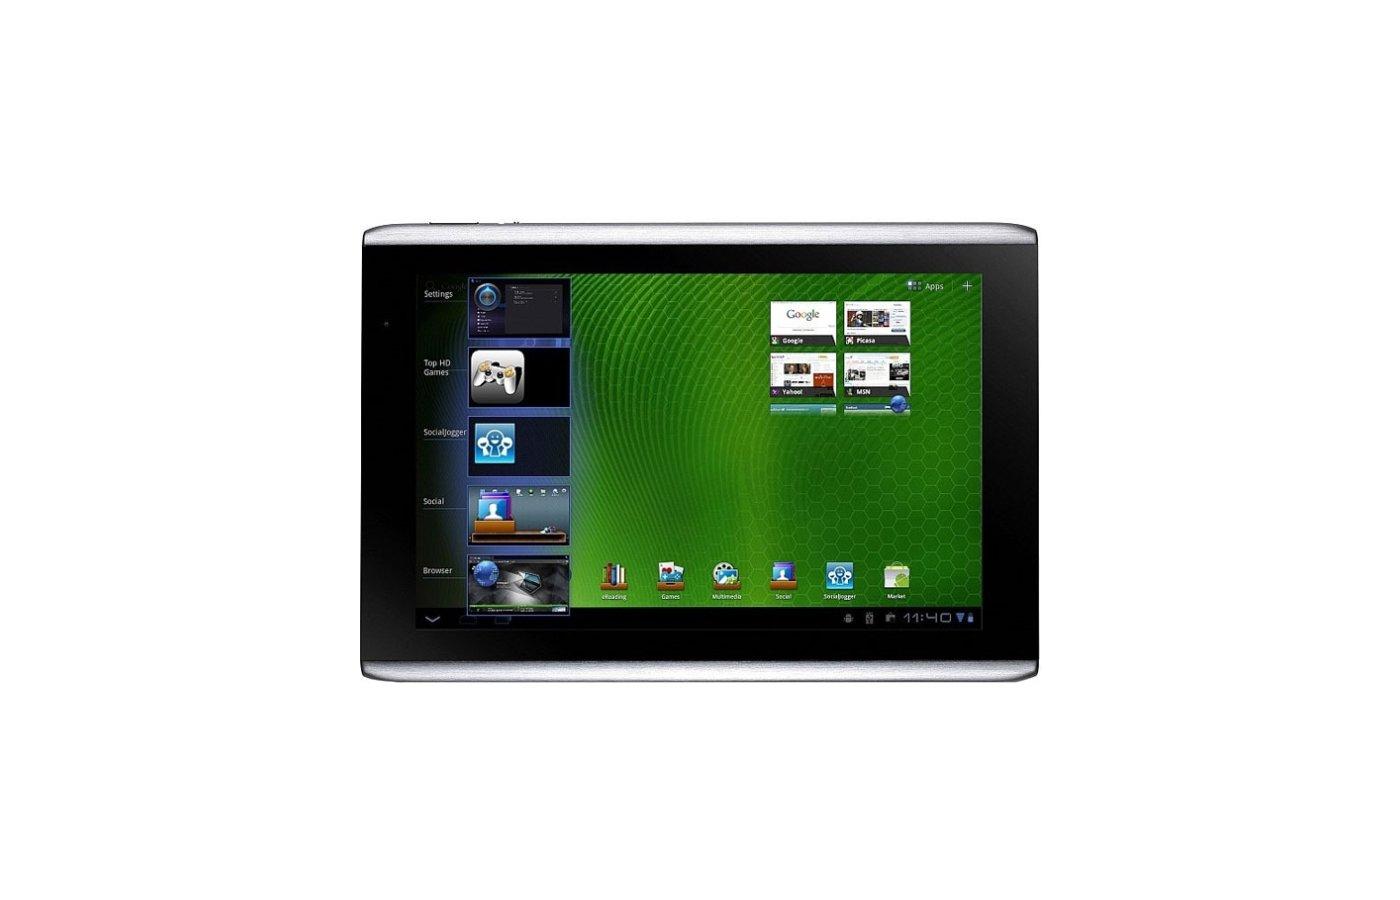 wi-fi, bluetooth gps вес 765 г аппаратной основой планшета